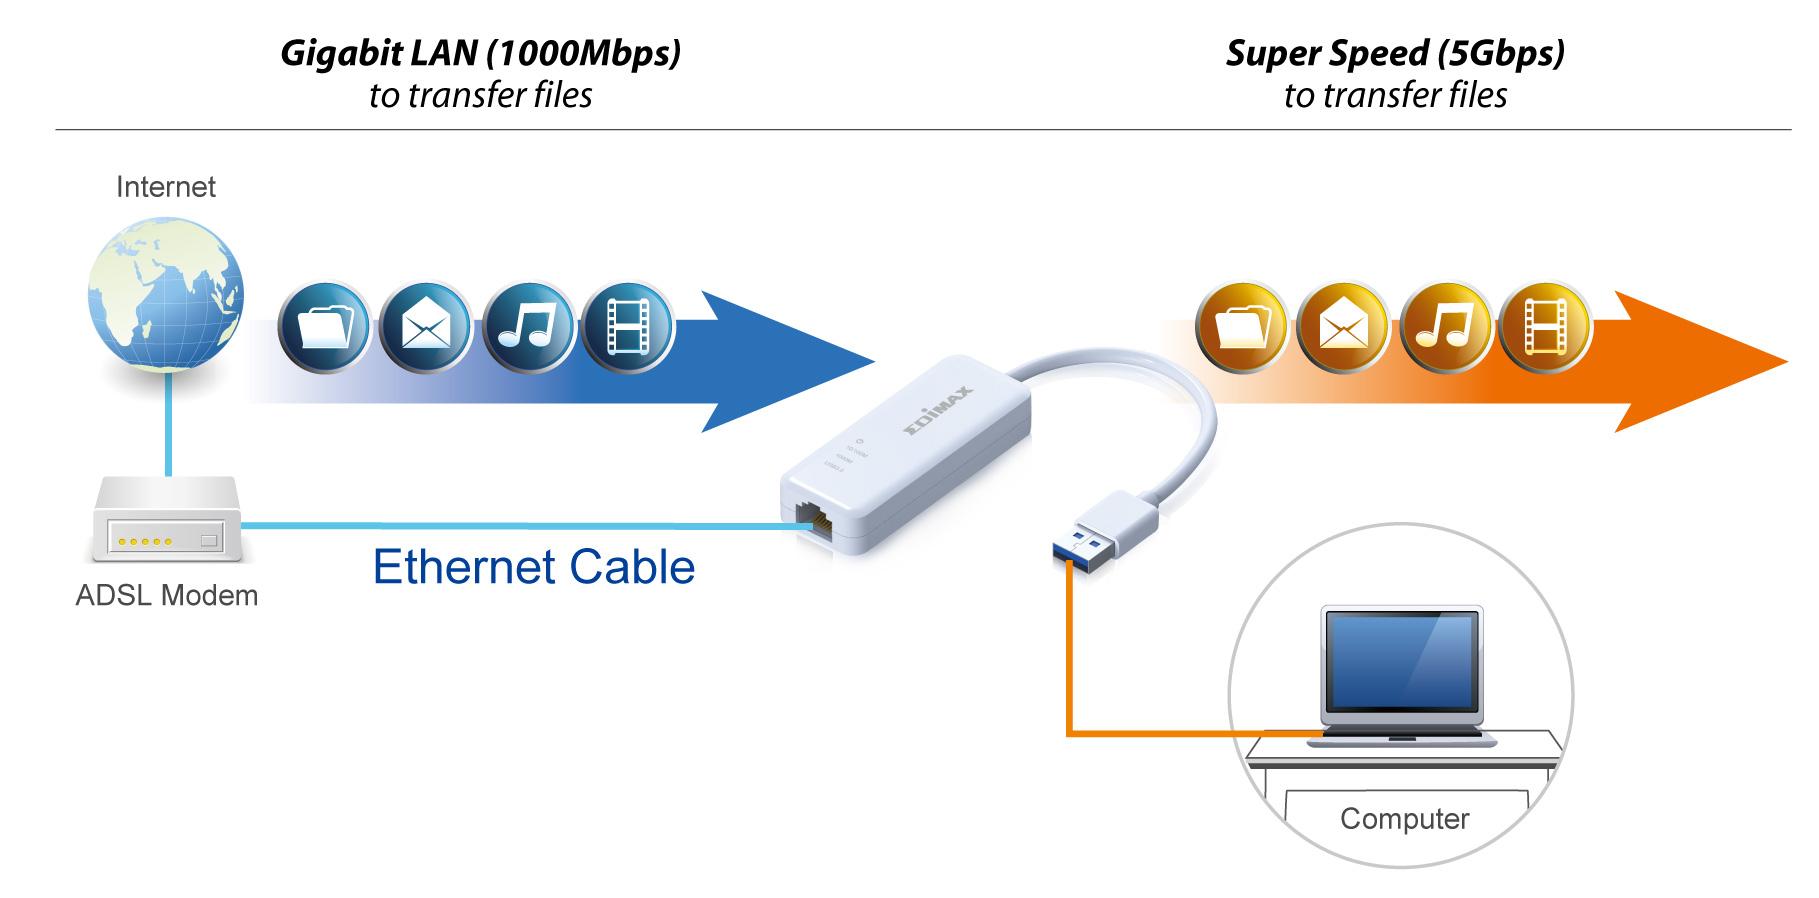 hight resolution of edimax usb3 0 gigabit ethernet adapter eu 4306 application diagram